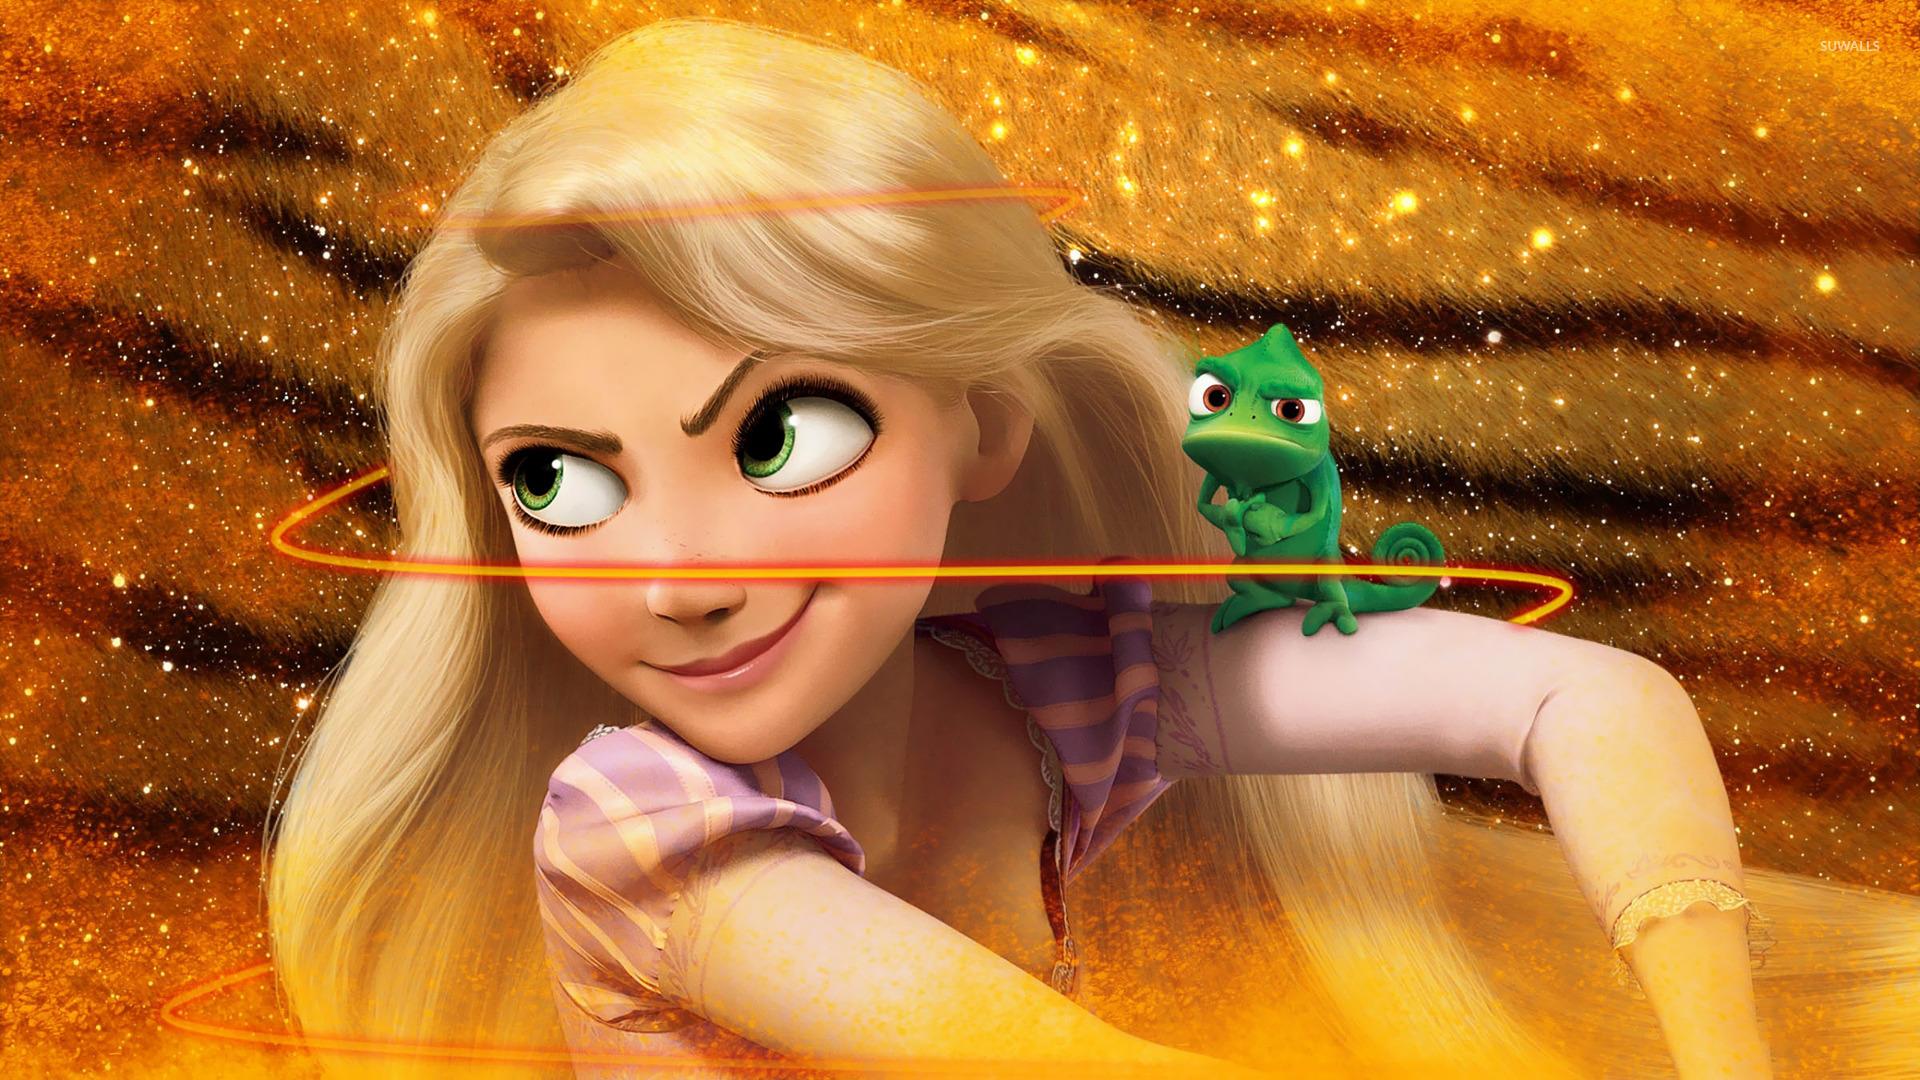 Rapunzel and Pascal - Tangled wallpaper - Cartoon wallpapers - #20213 for Tangled Wallpaper Rapunzel And Flynn  166kxo